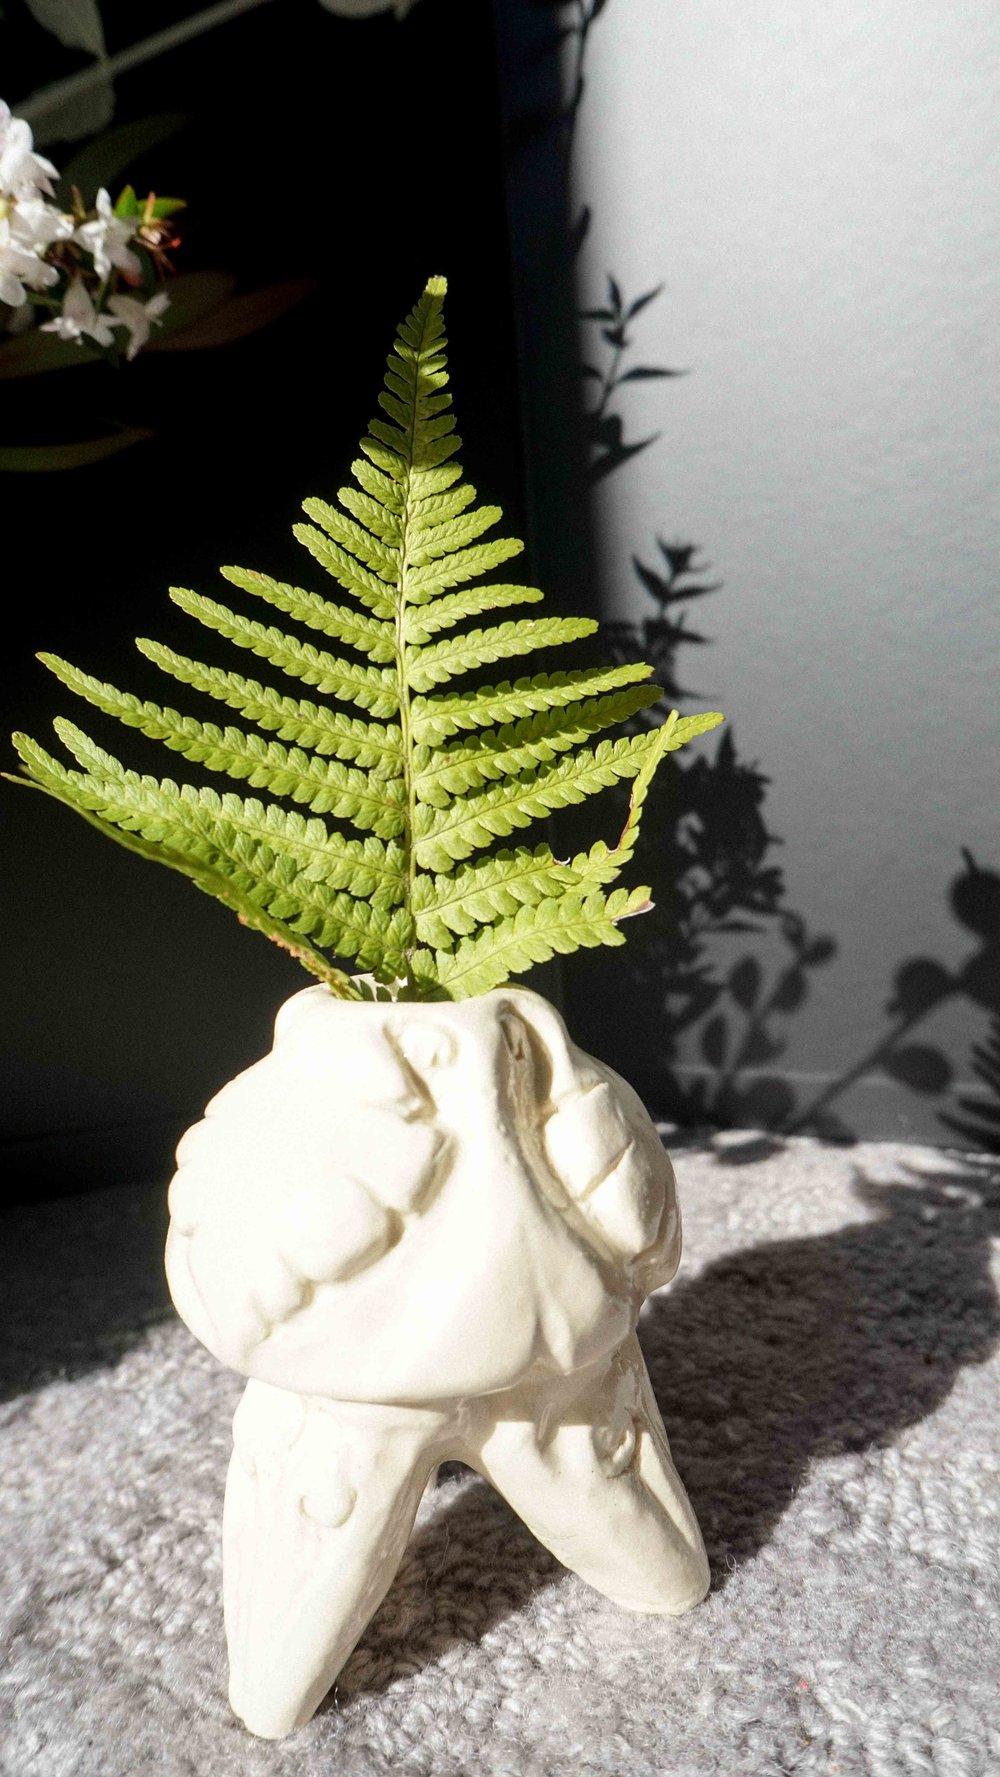 Image of Ceramics incense holder